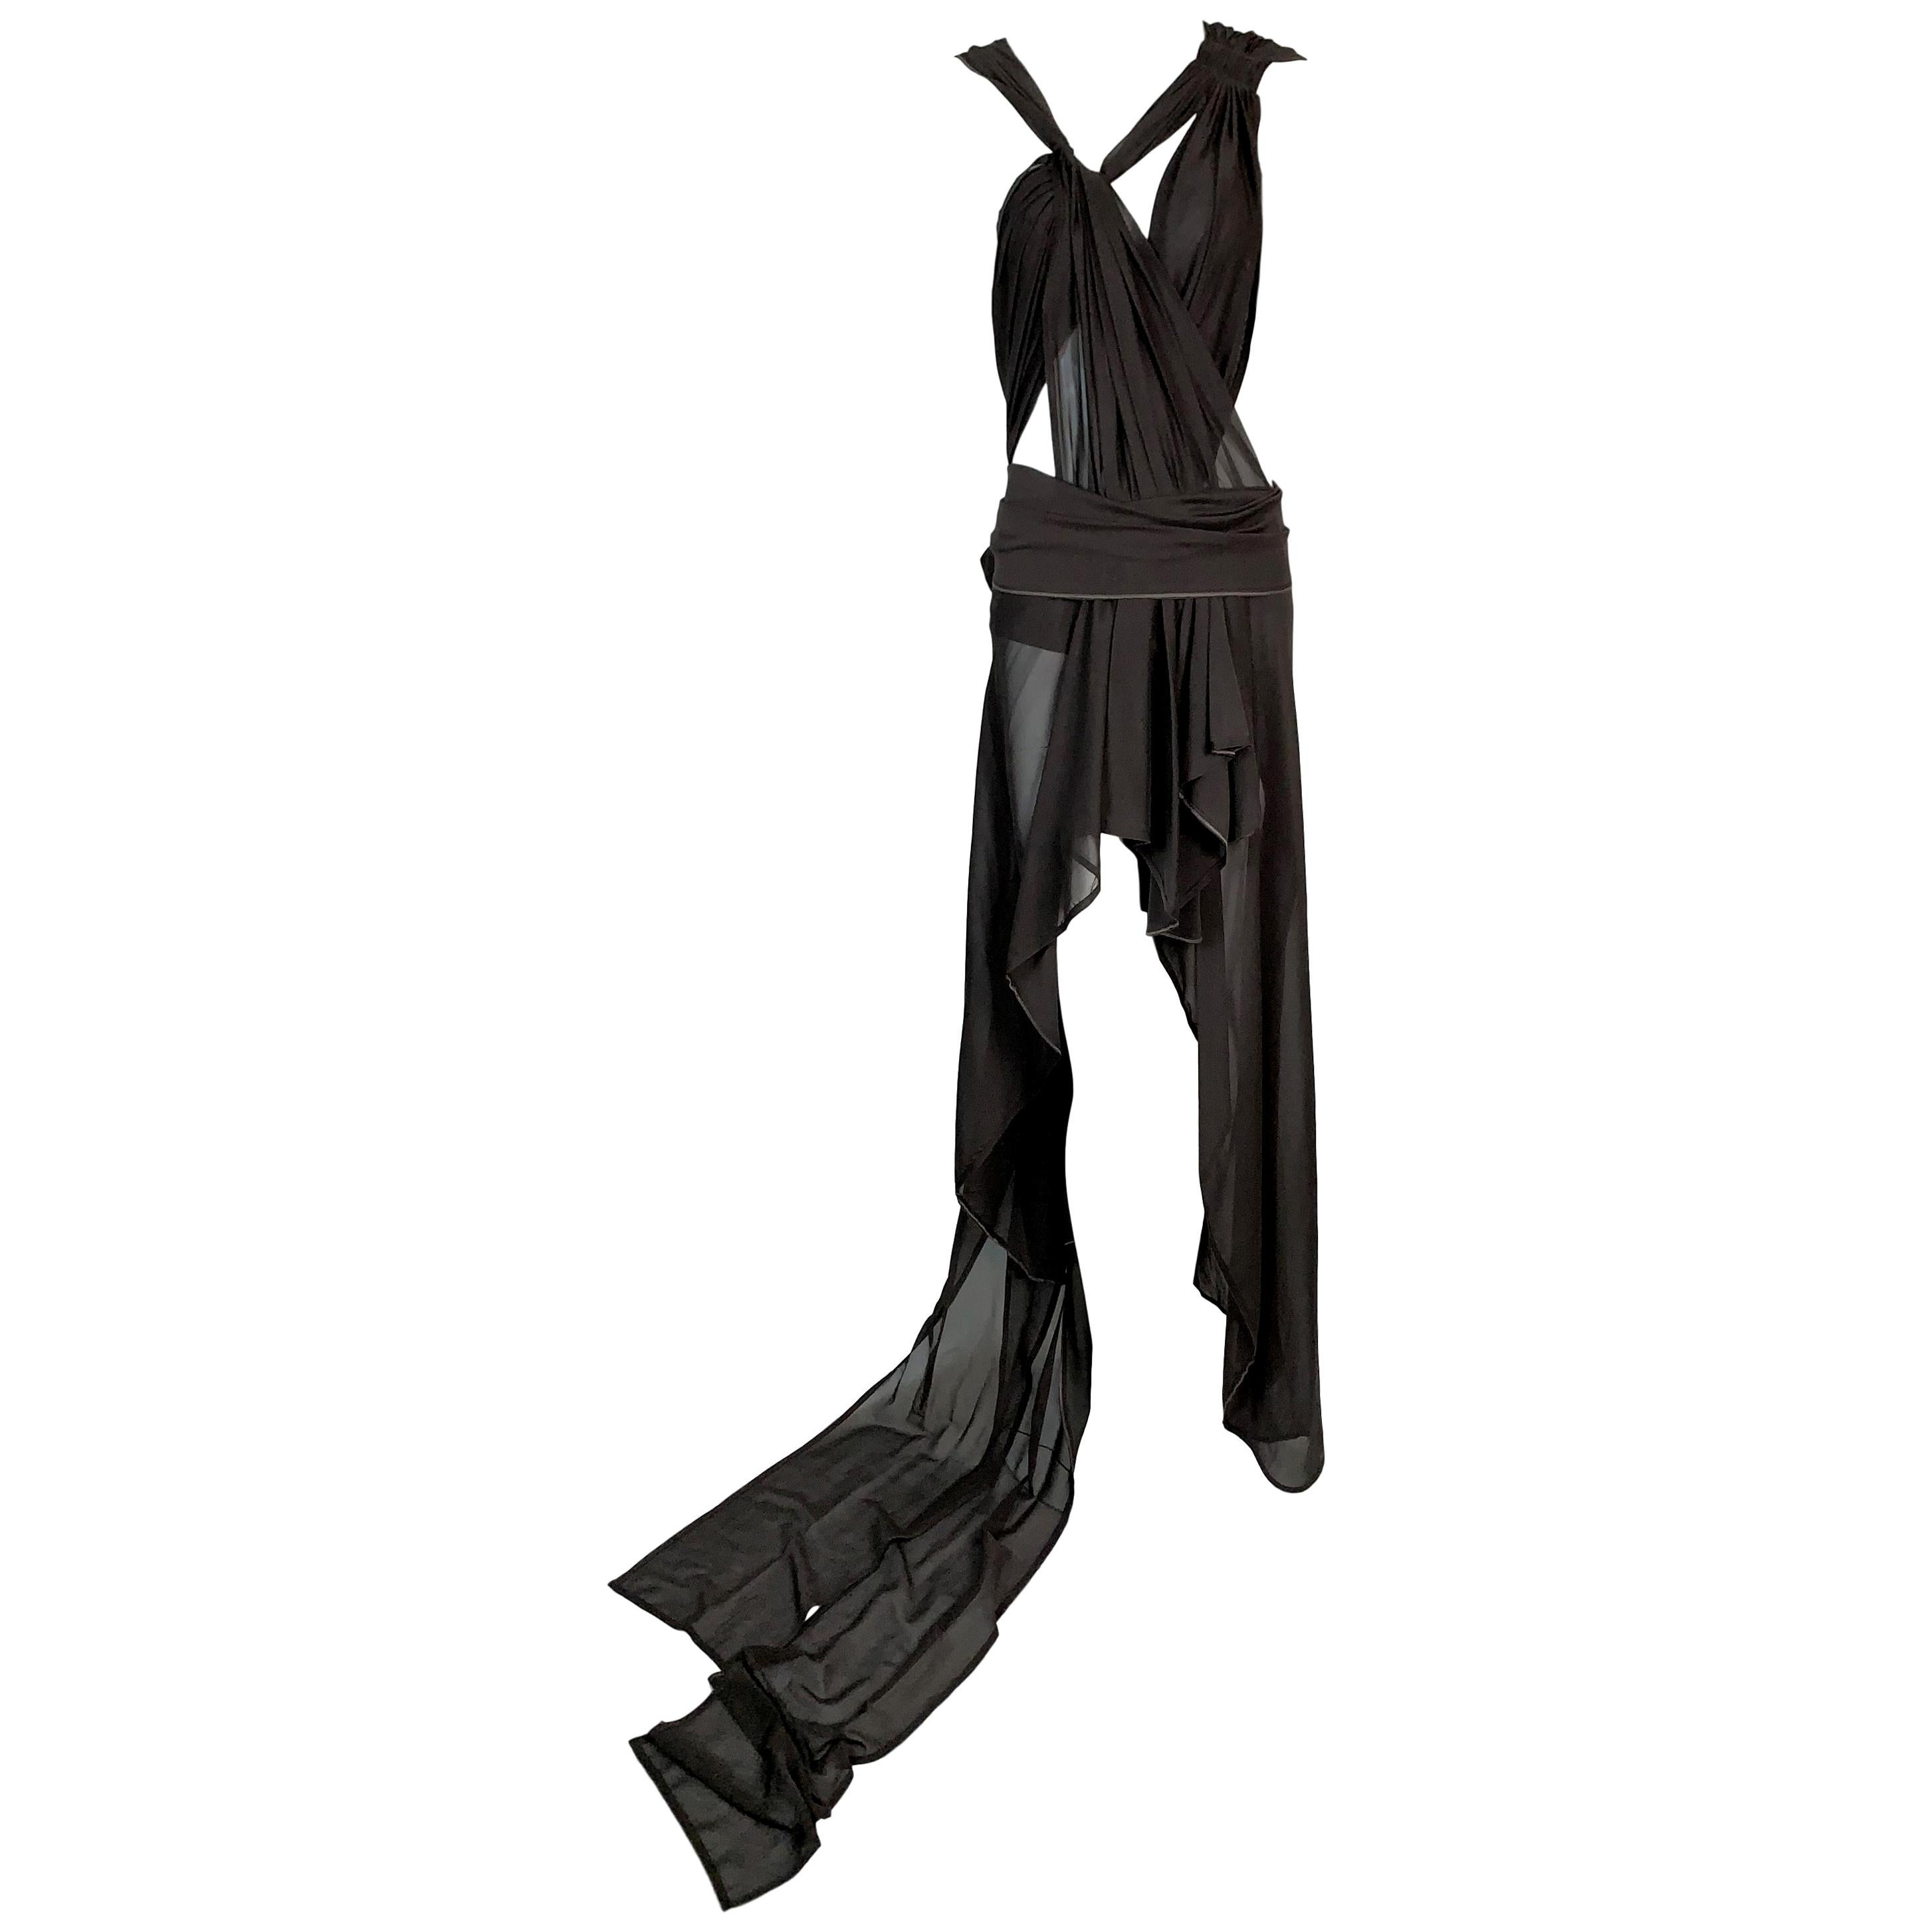 S/S 2002 Yves Saint Laurent Tom Ford Runway Sheer Brown Silk Cut-Out Dress